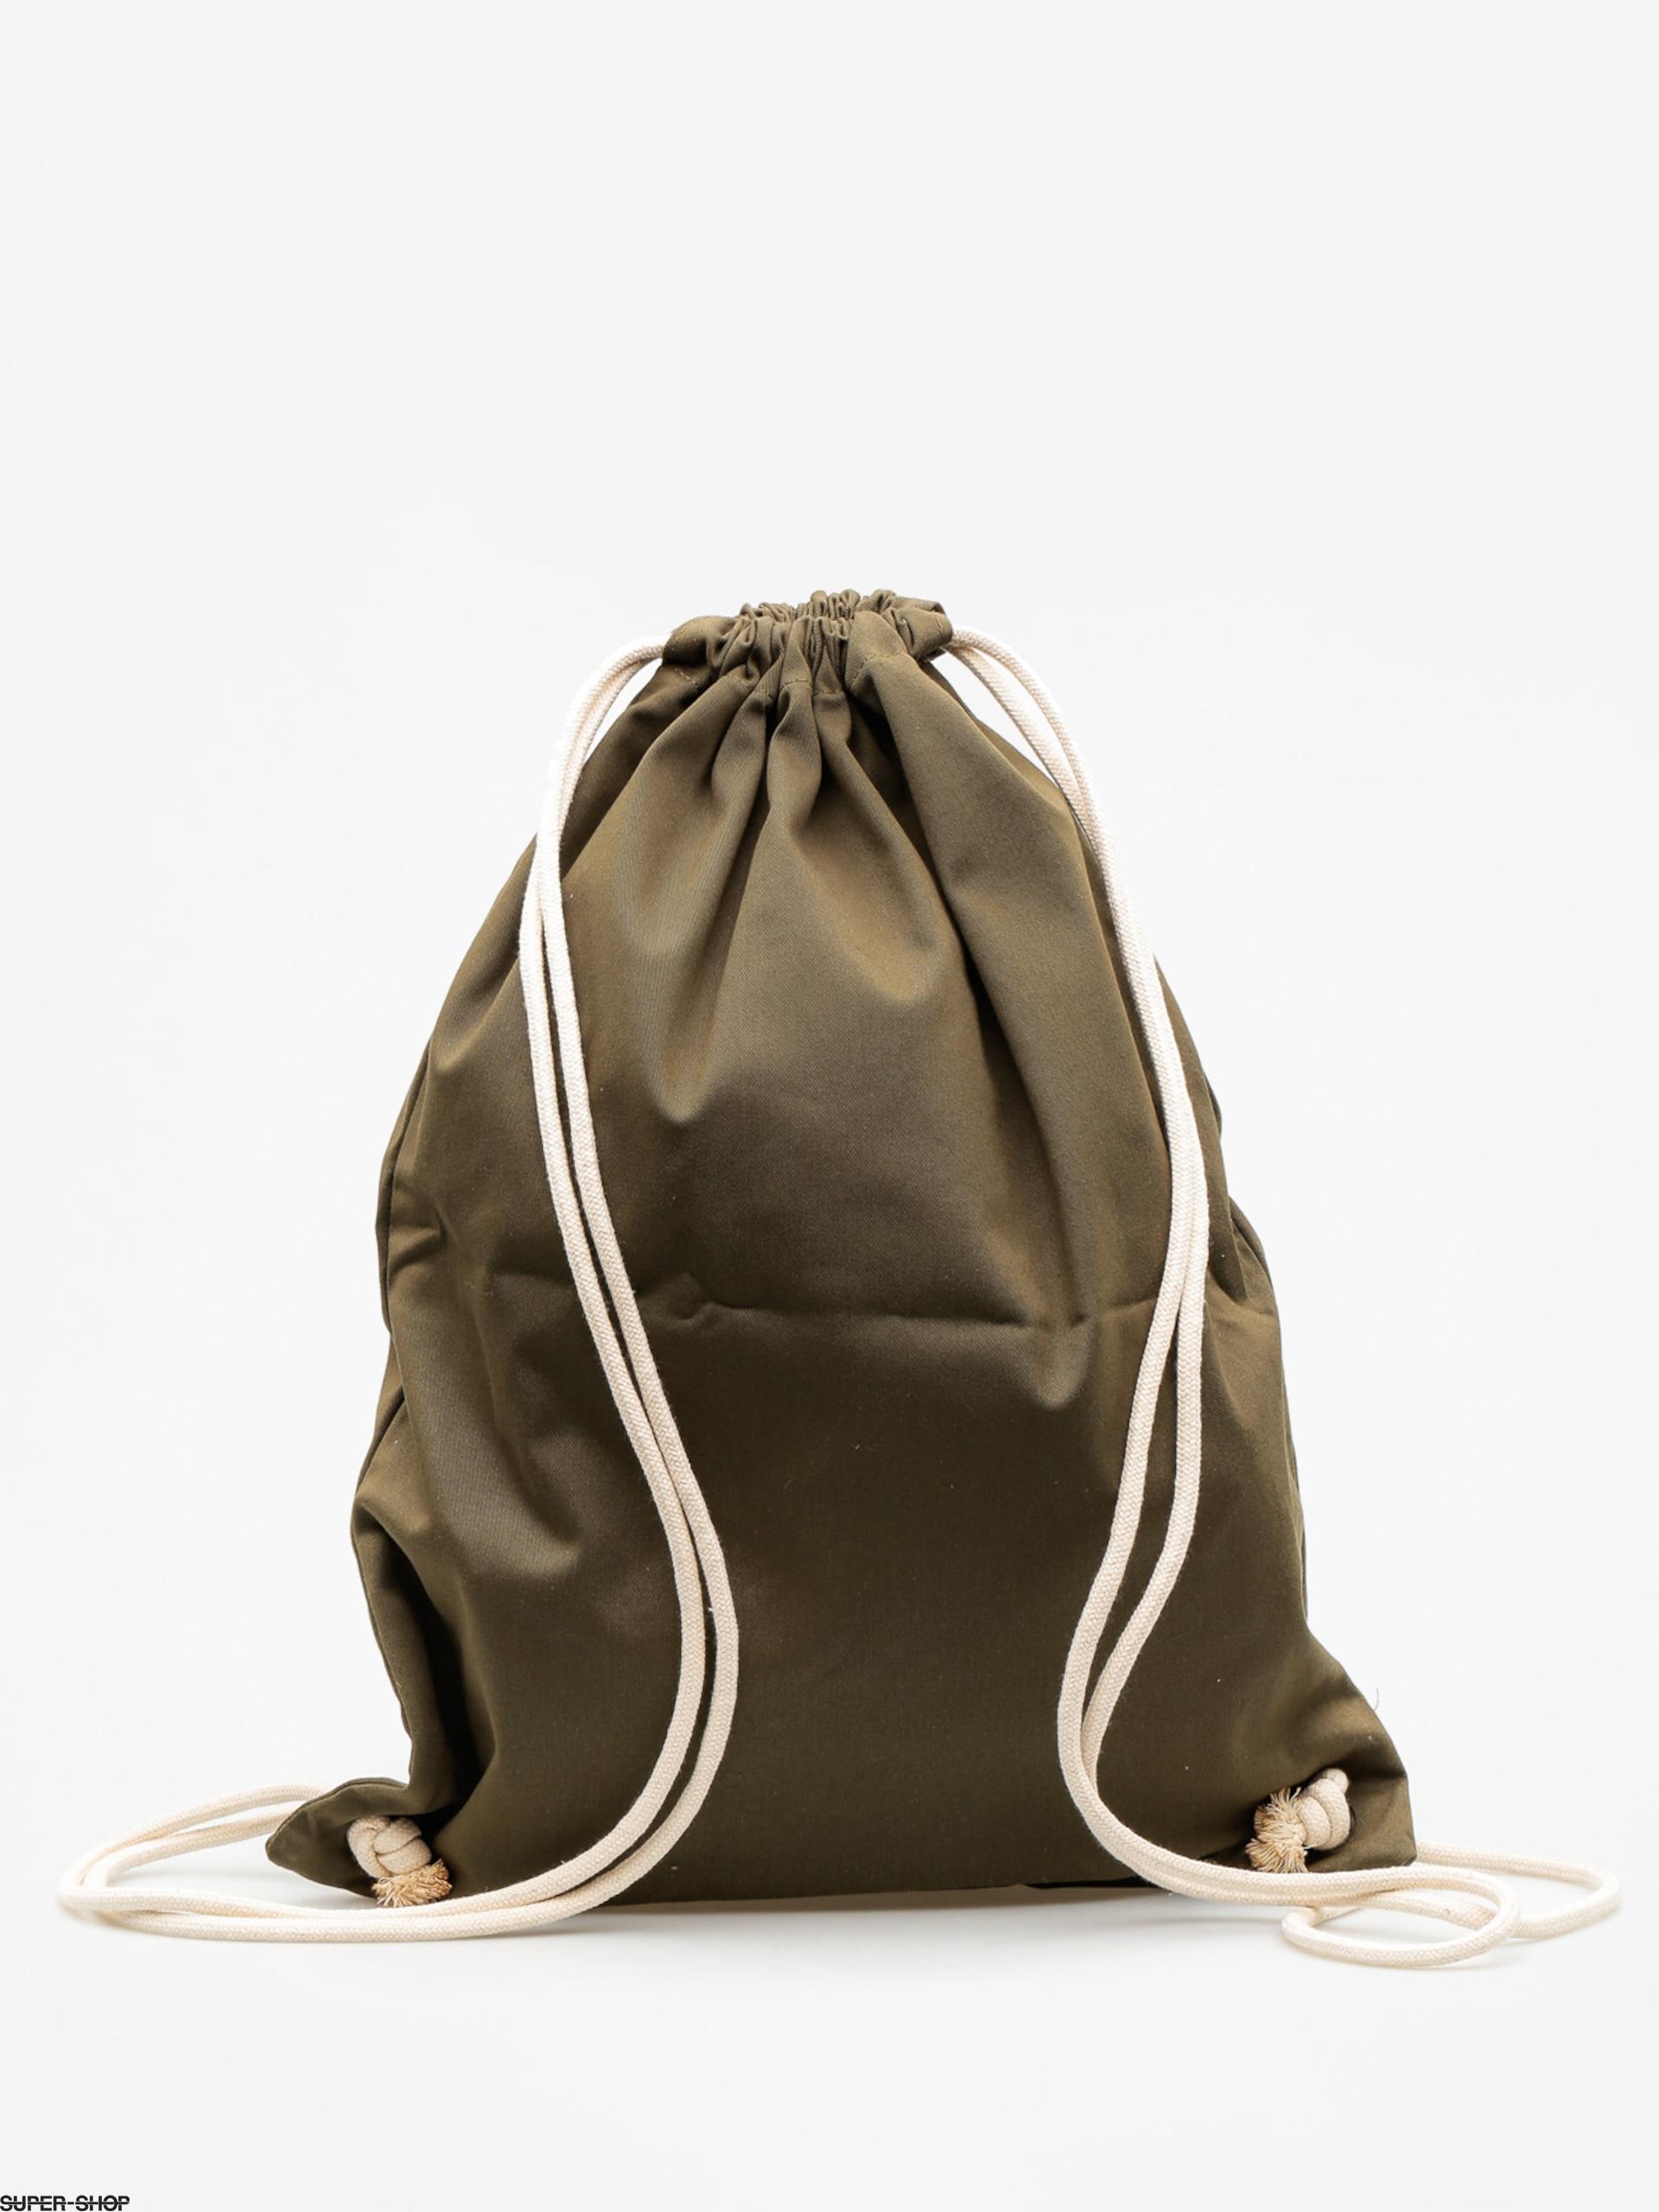 najlepszy design spotykać się niska cena Turbokolor Backpack Shoe Bag (keep on khaki)